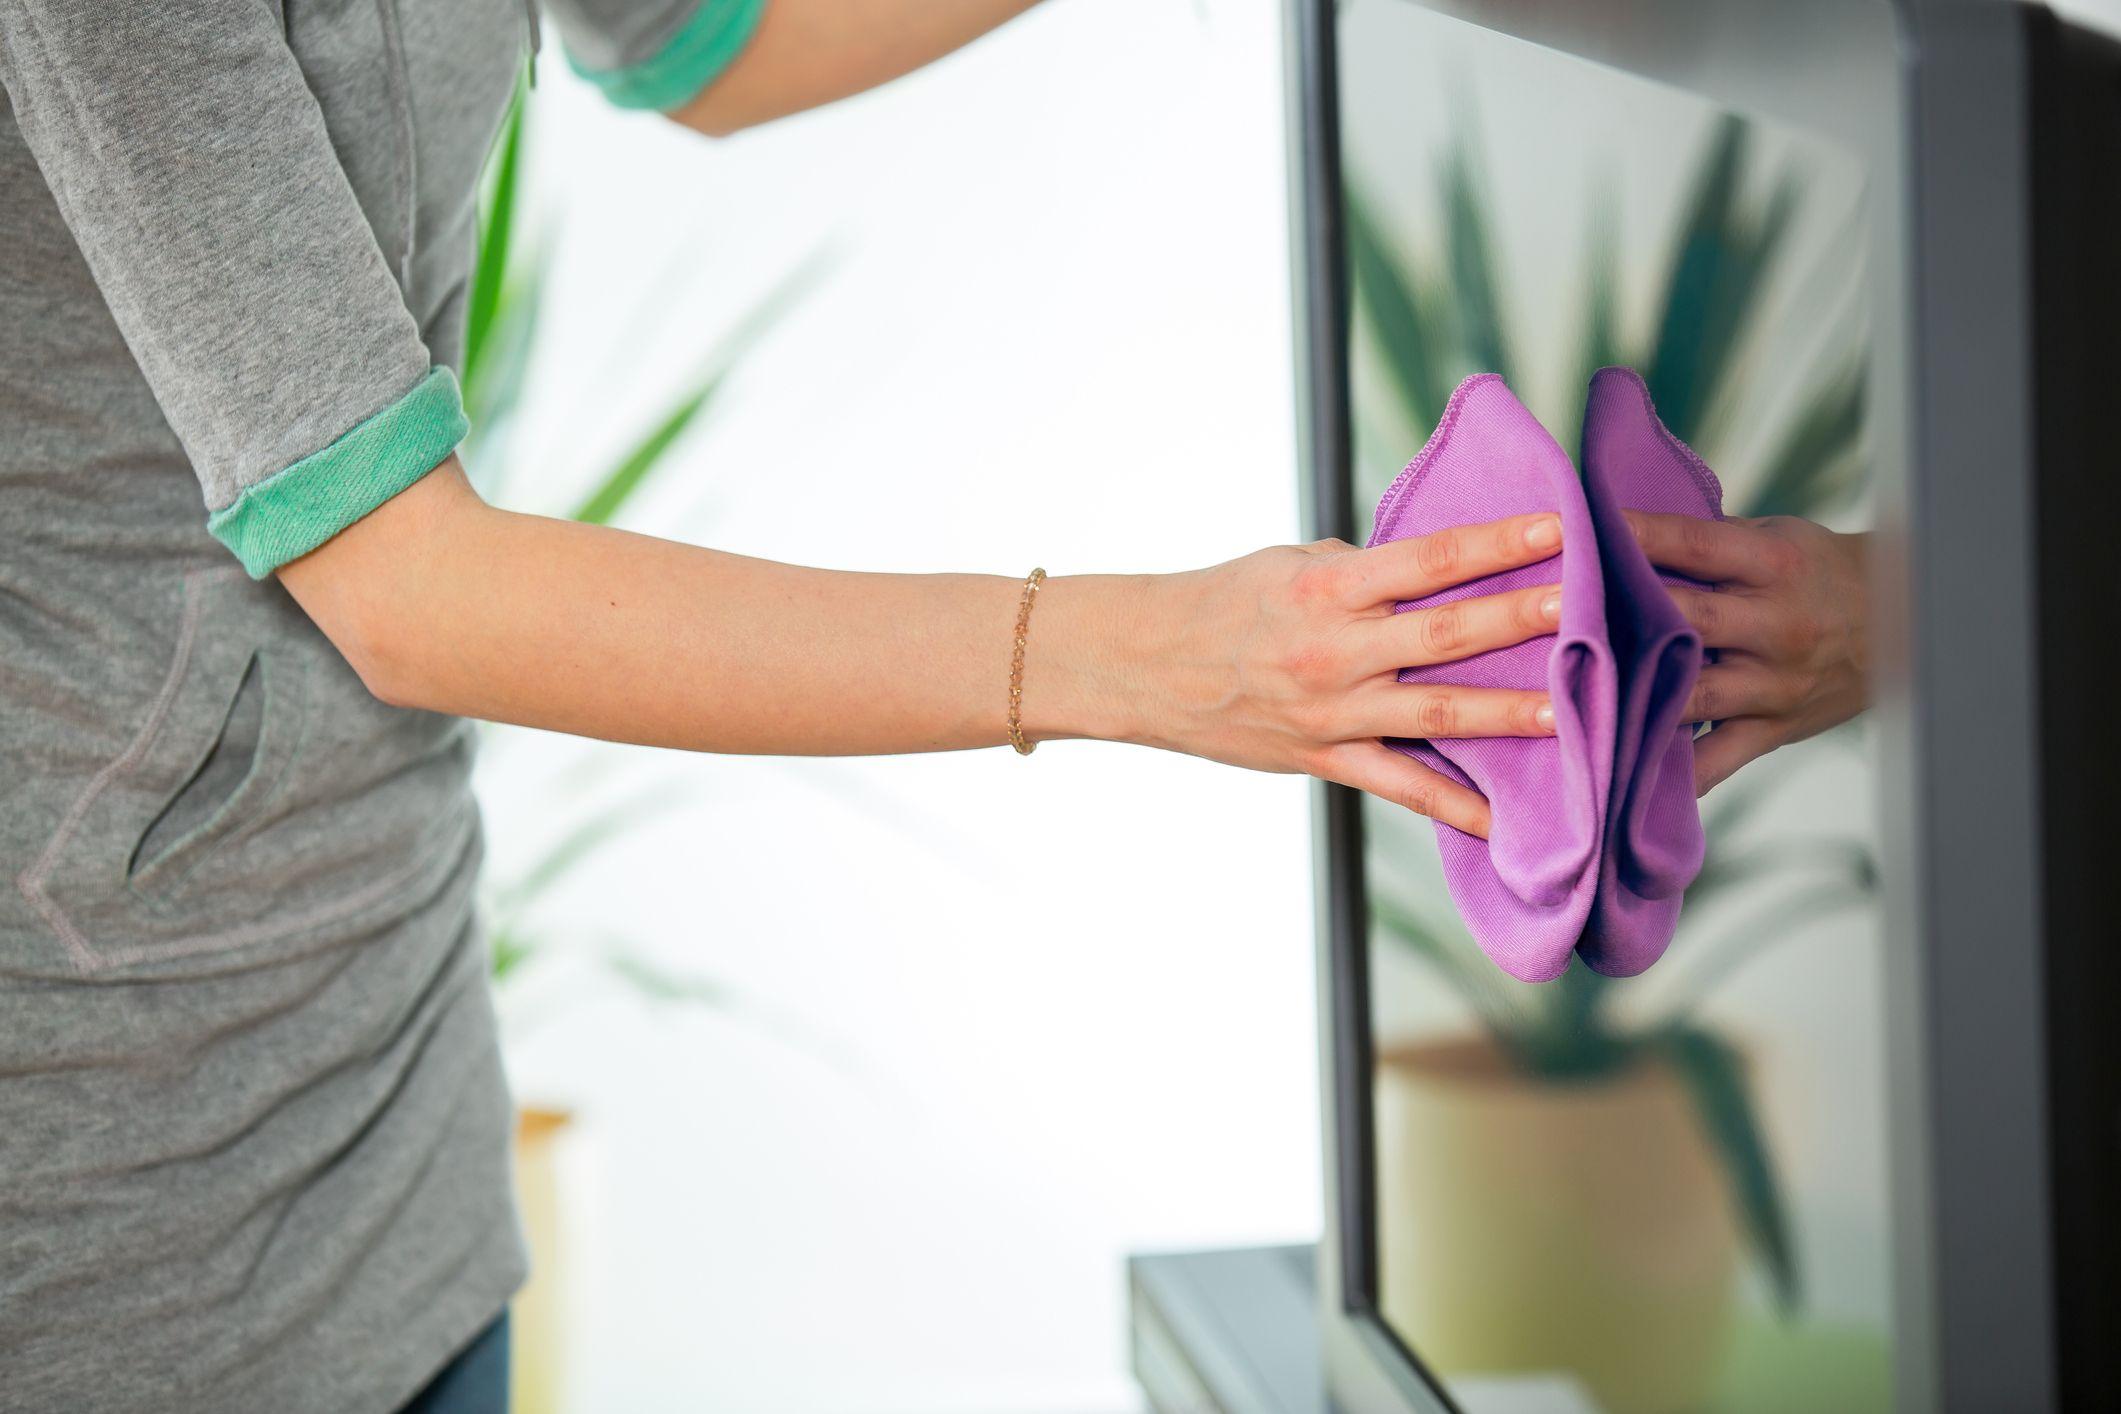 دستمال کشیدن تلویزیون